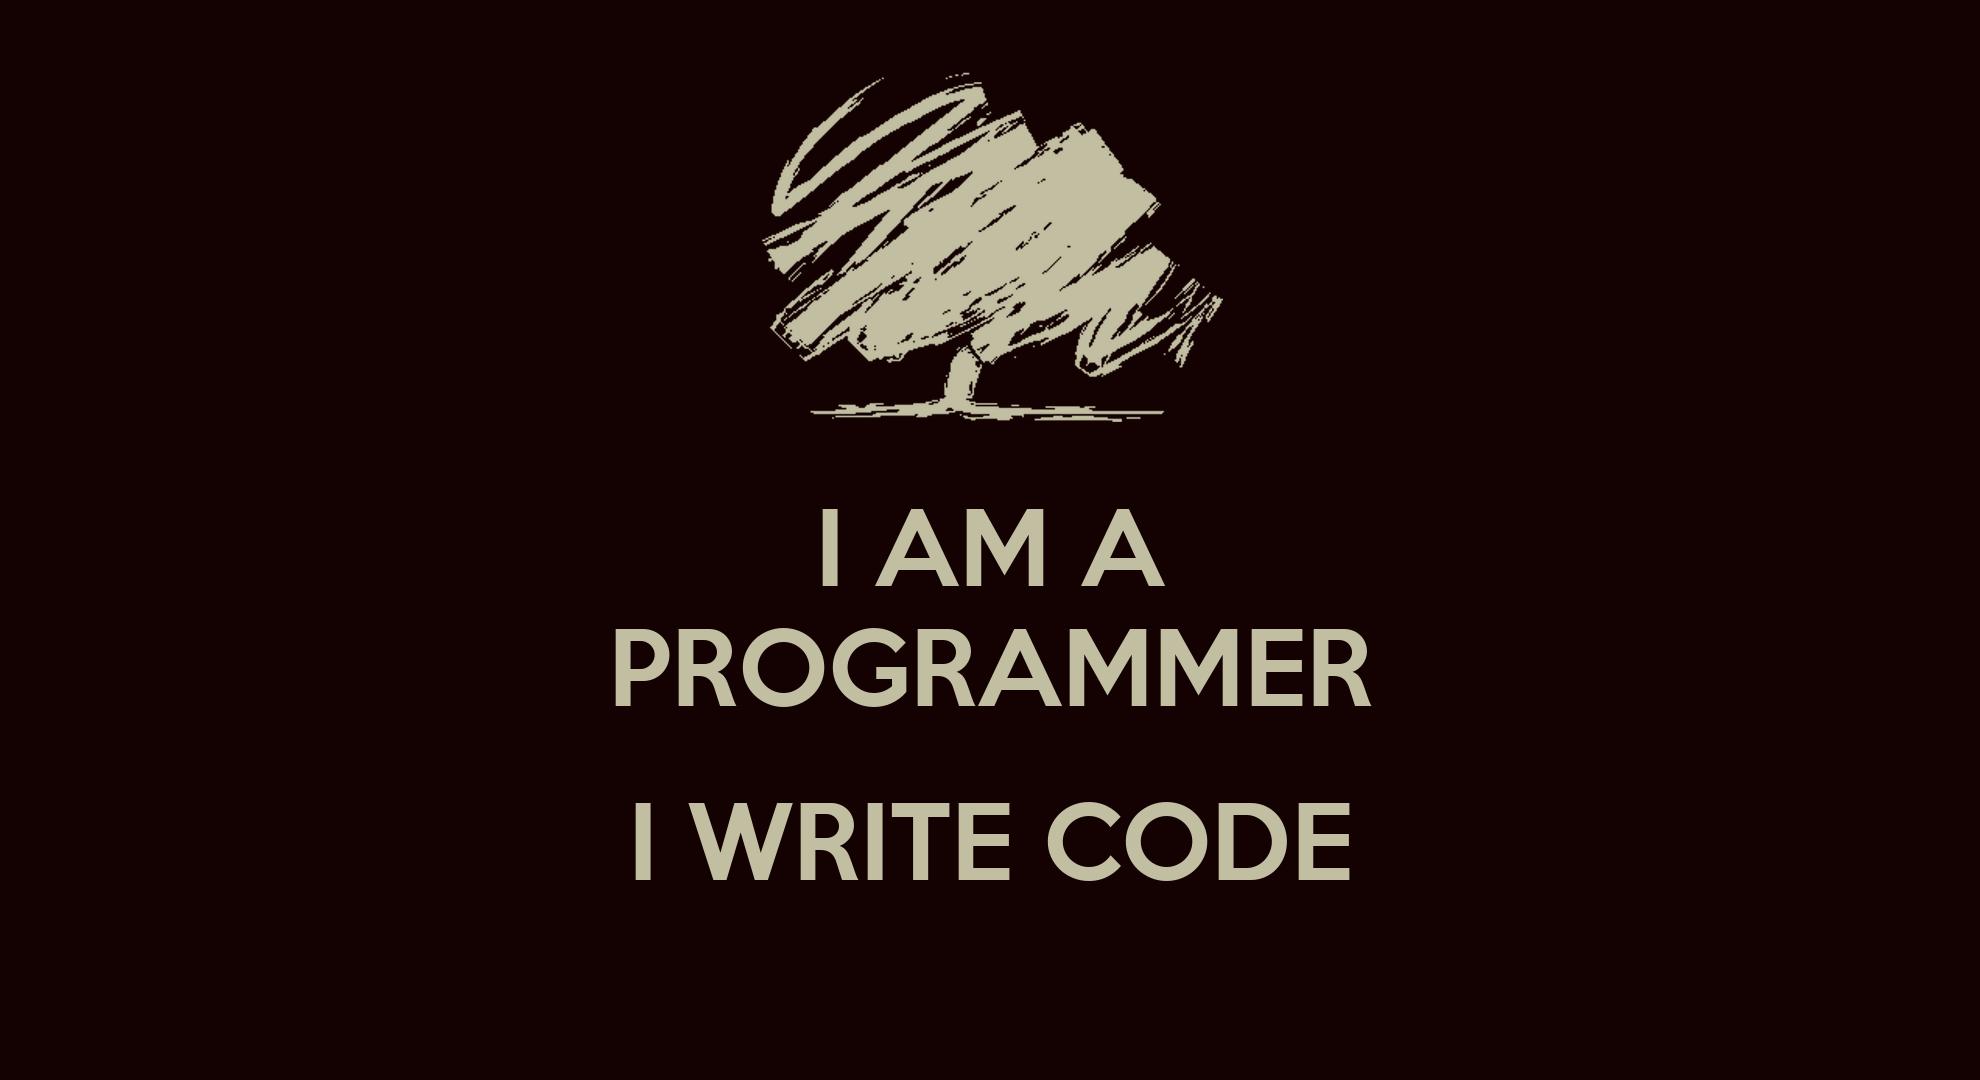 Cute Coffee Mug Wallpaper I Am A Programmer I Write Code Poster K Keep Calm O Matic